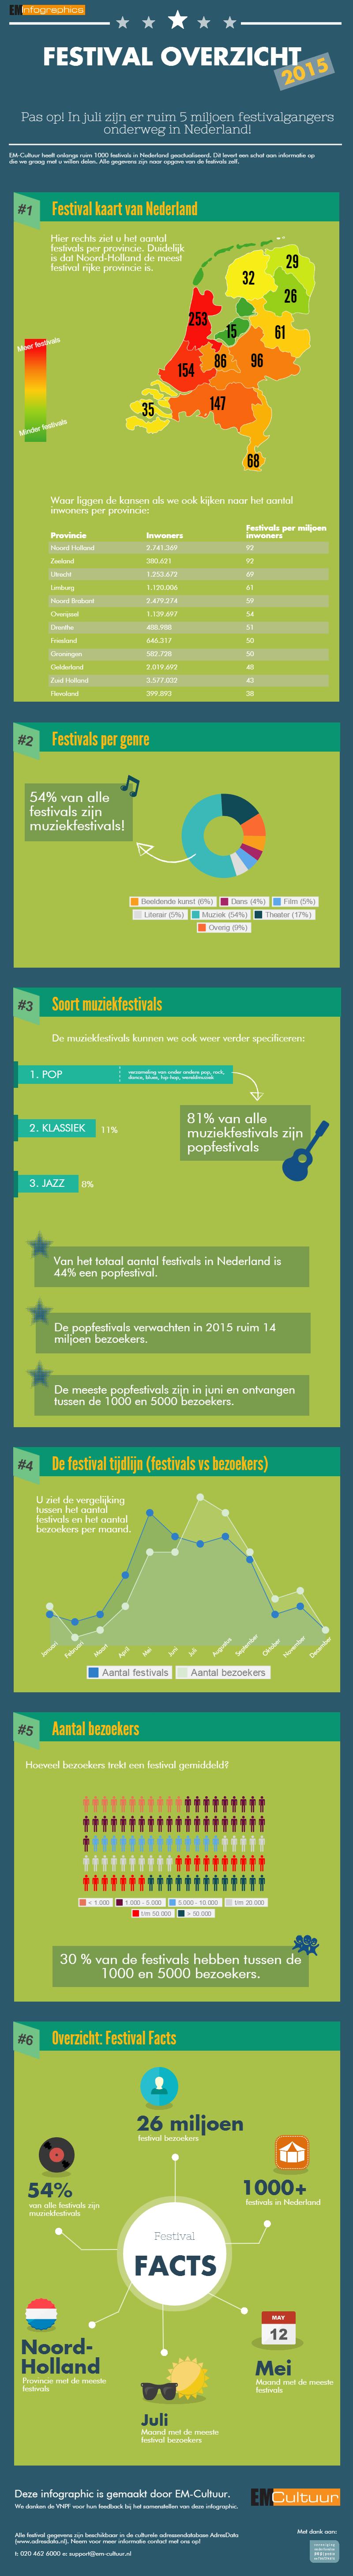 Festival Overzicht 2015 Inforgraphic